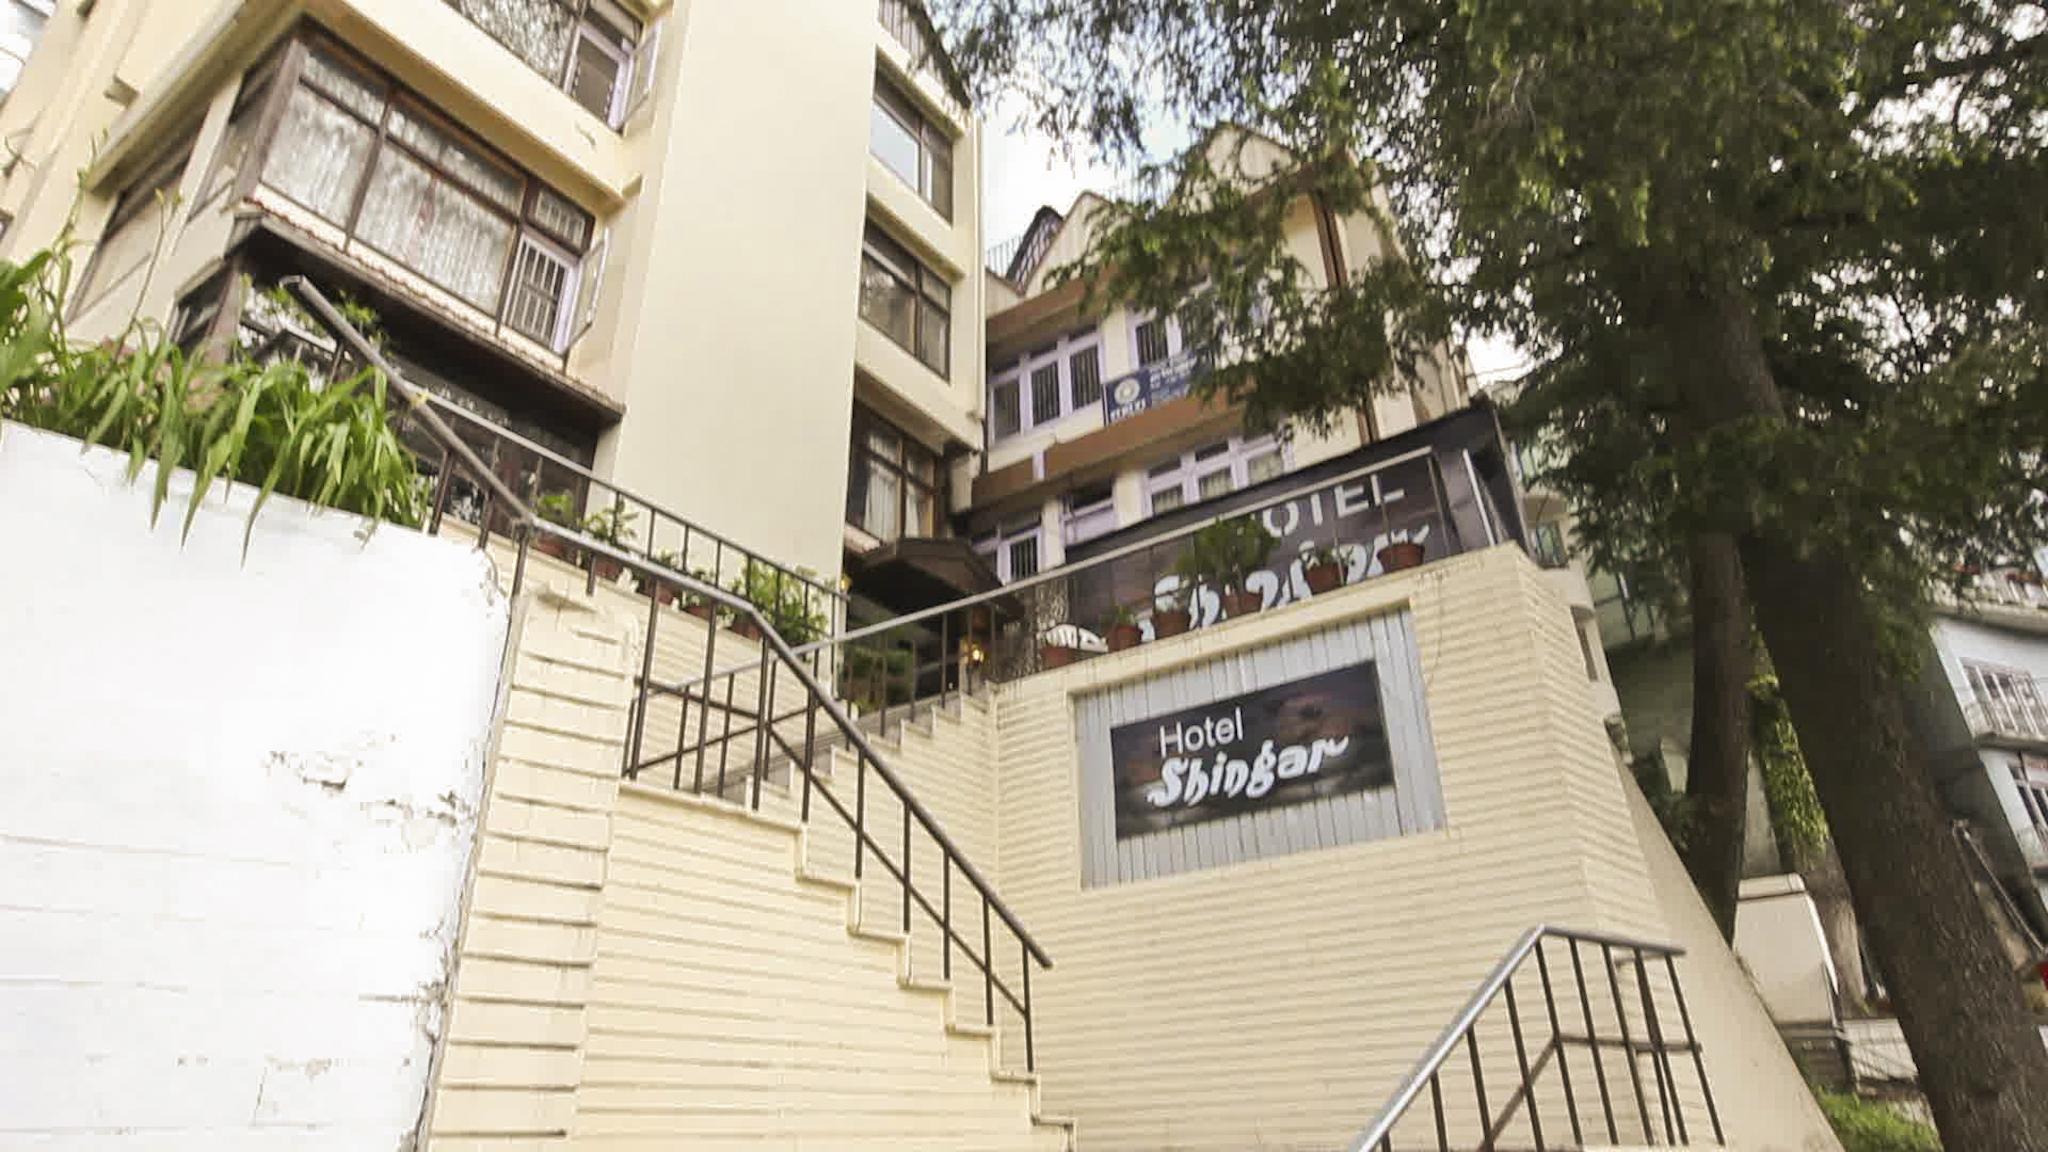 Hotel Shingar in Shimla